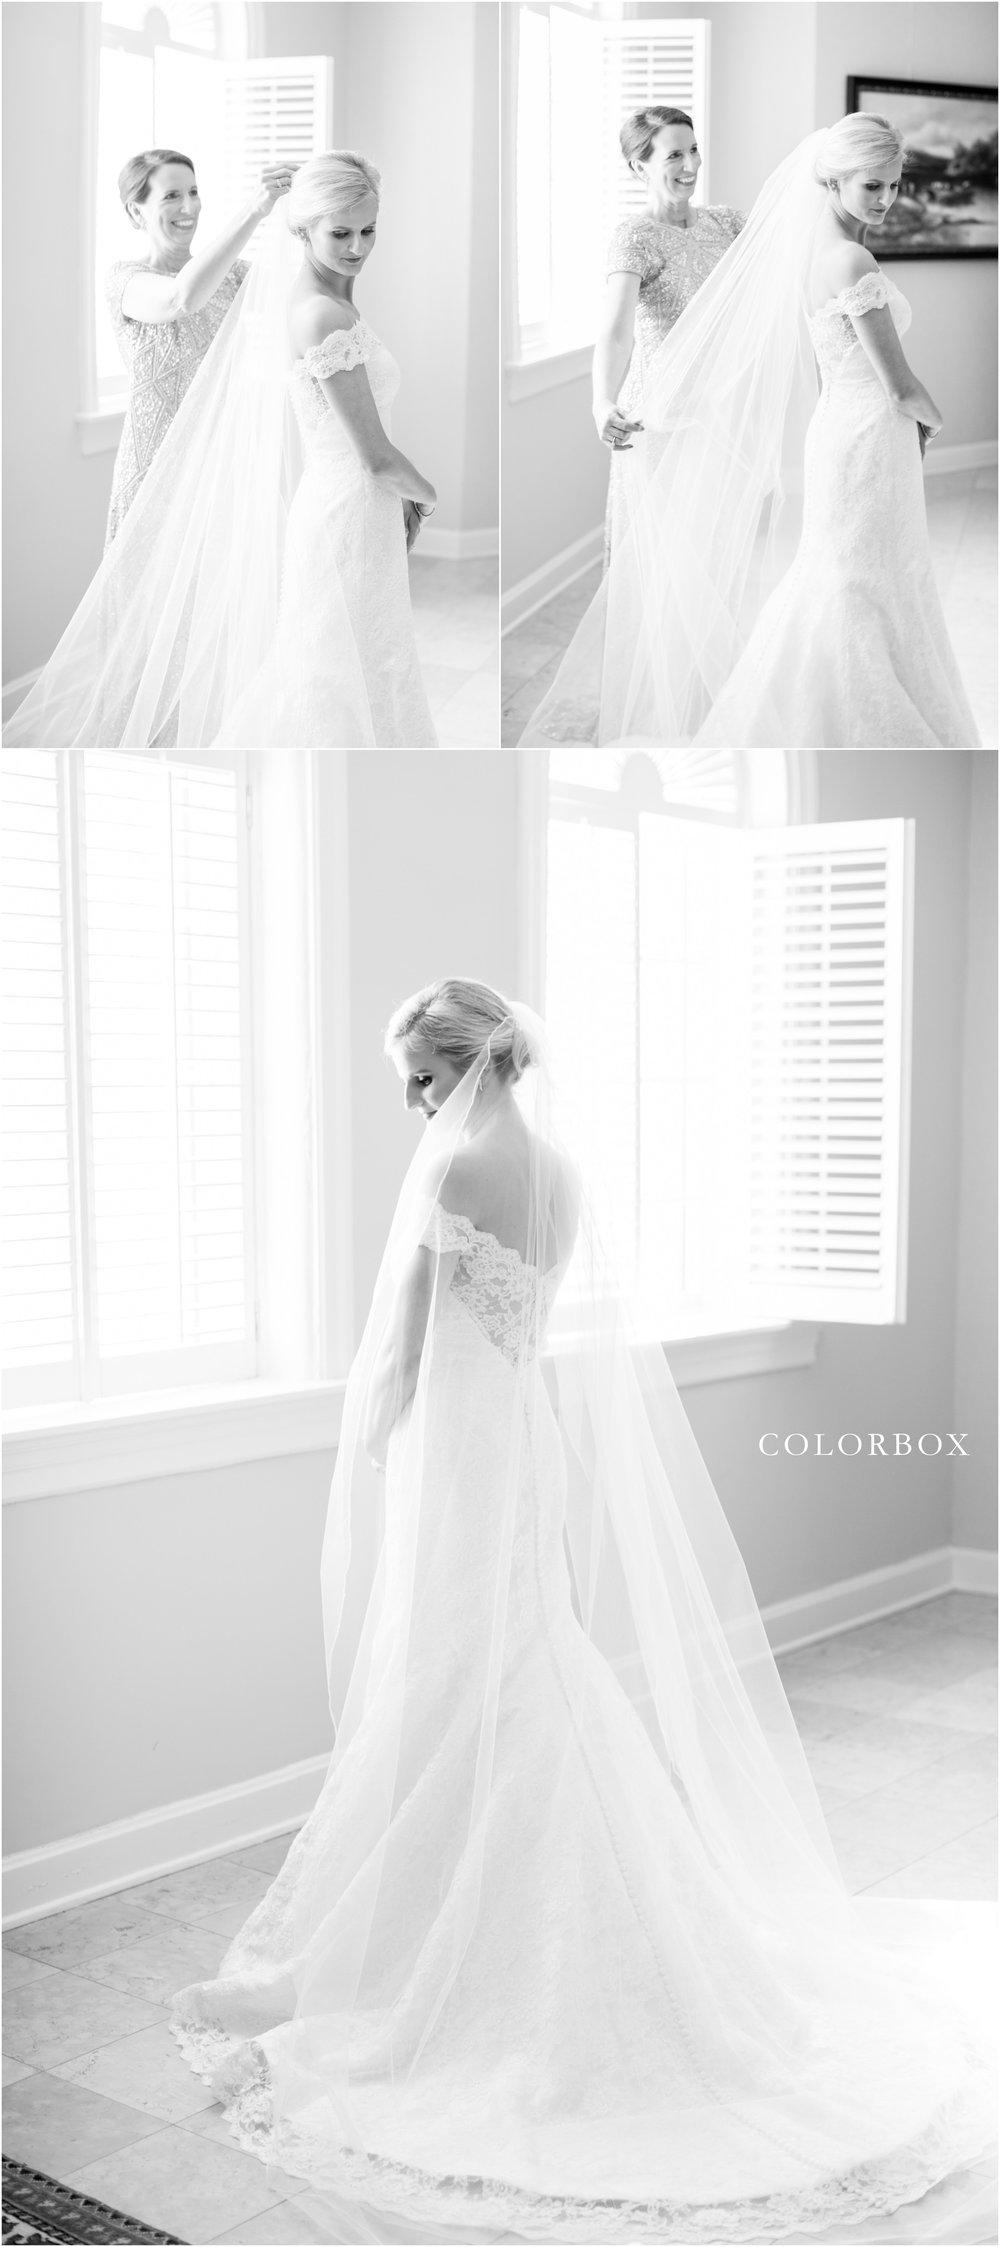 colorboxphotographers_5707.jpg